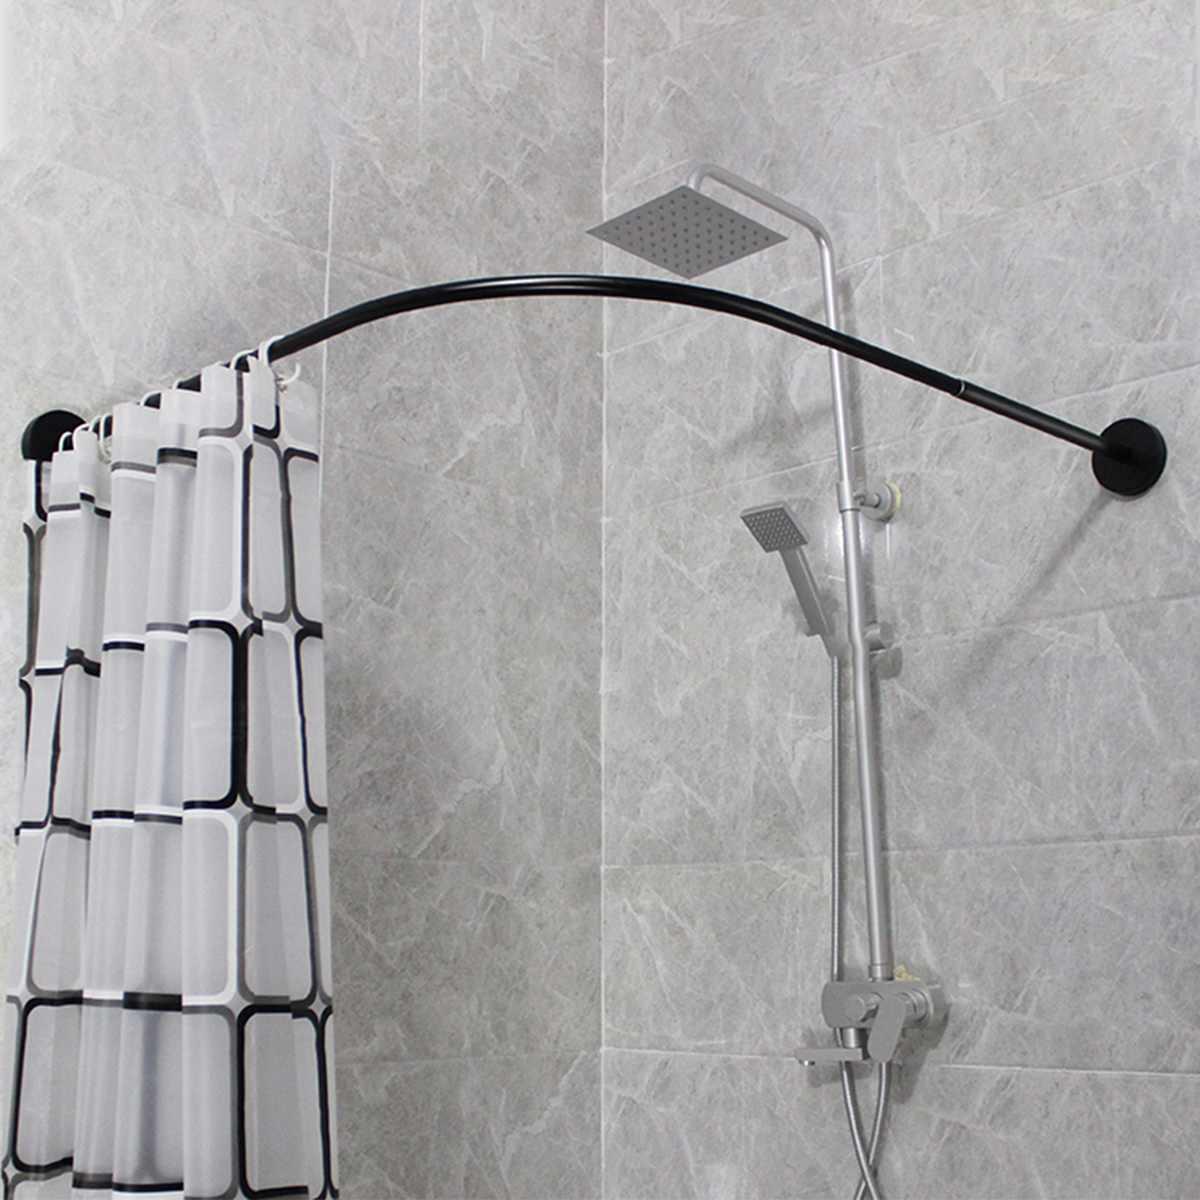 70-110 cm Barra telesc/ópica Extensible de Acero Inoxidable para Cortina de Ducha Frenessa Barra Resistente para Colgar sin perforaci/ón Color Plateado